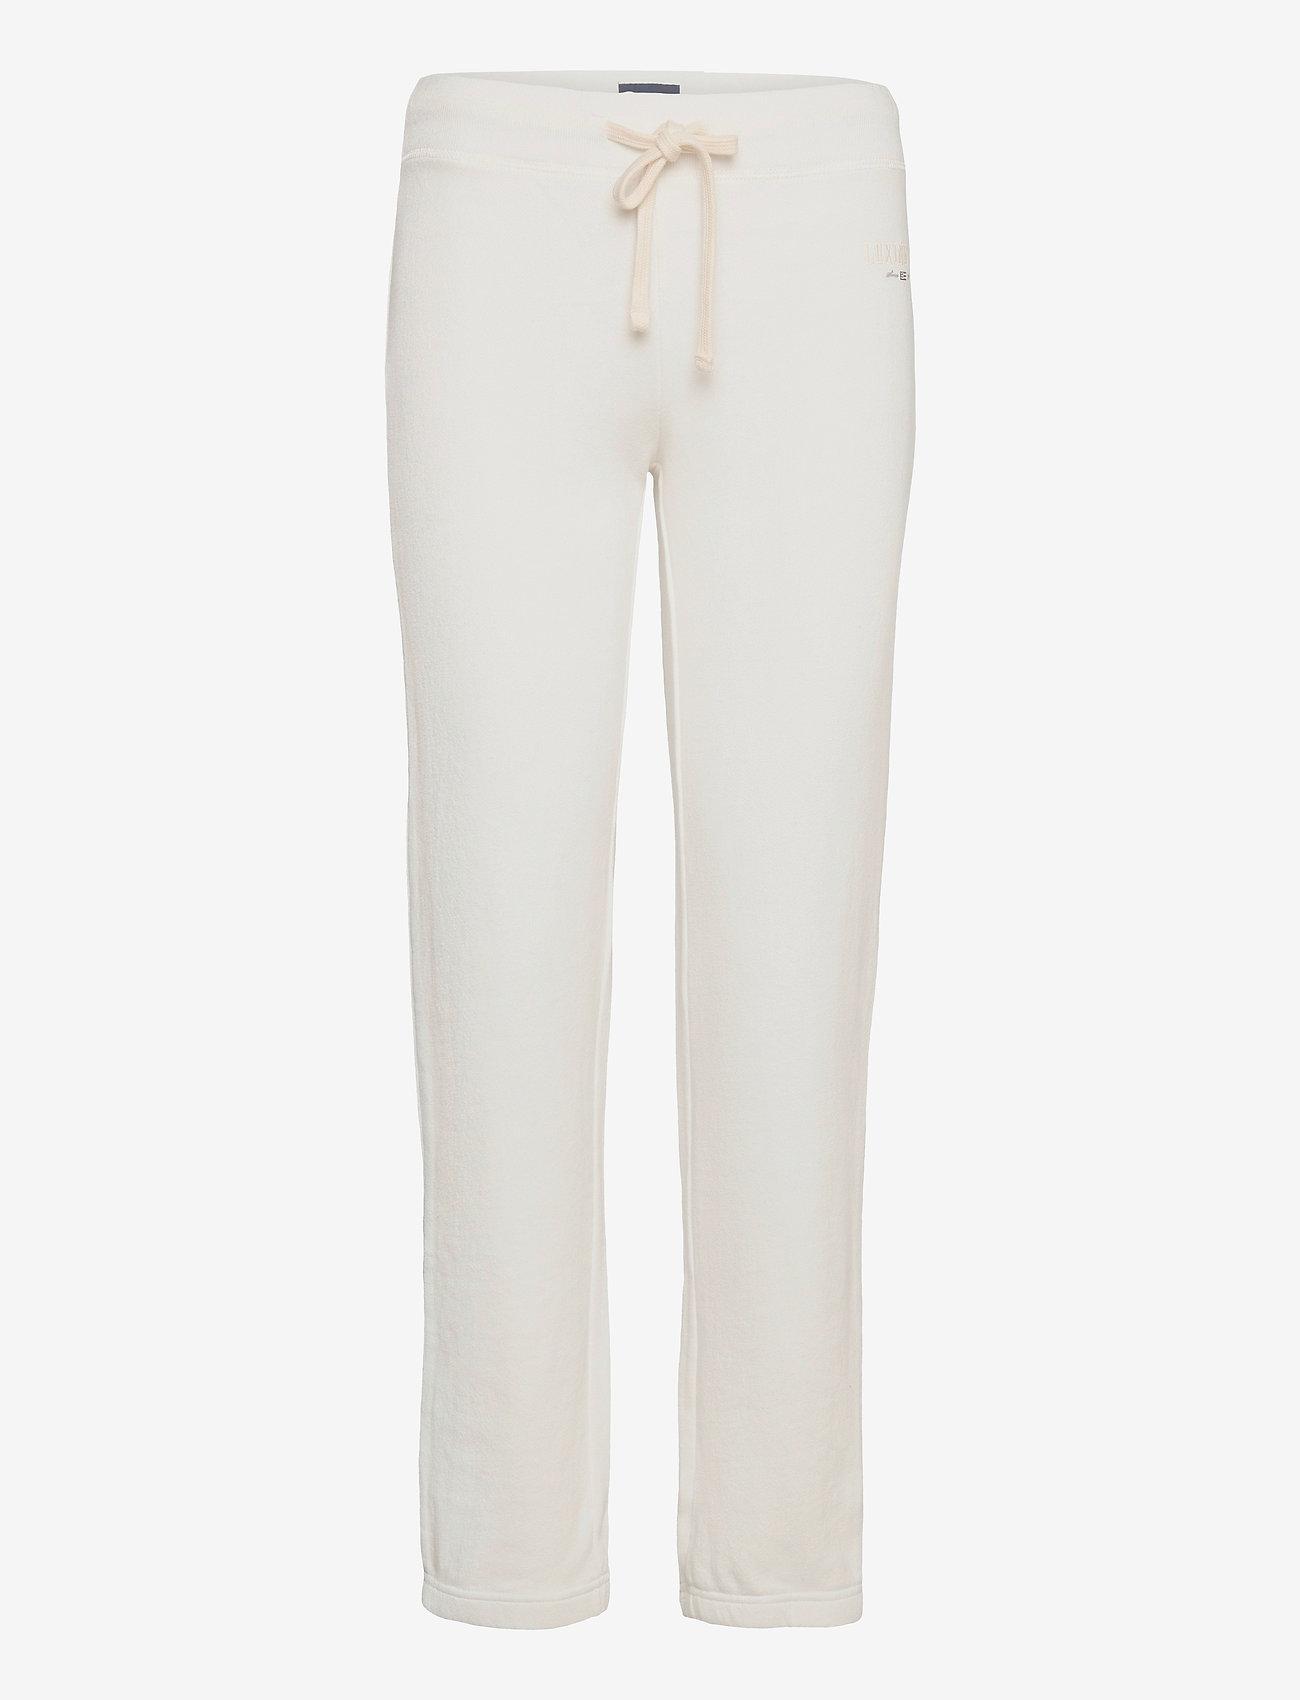 Lexington Clothing - Jenna Pants - sweatpants - offwhite - 0